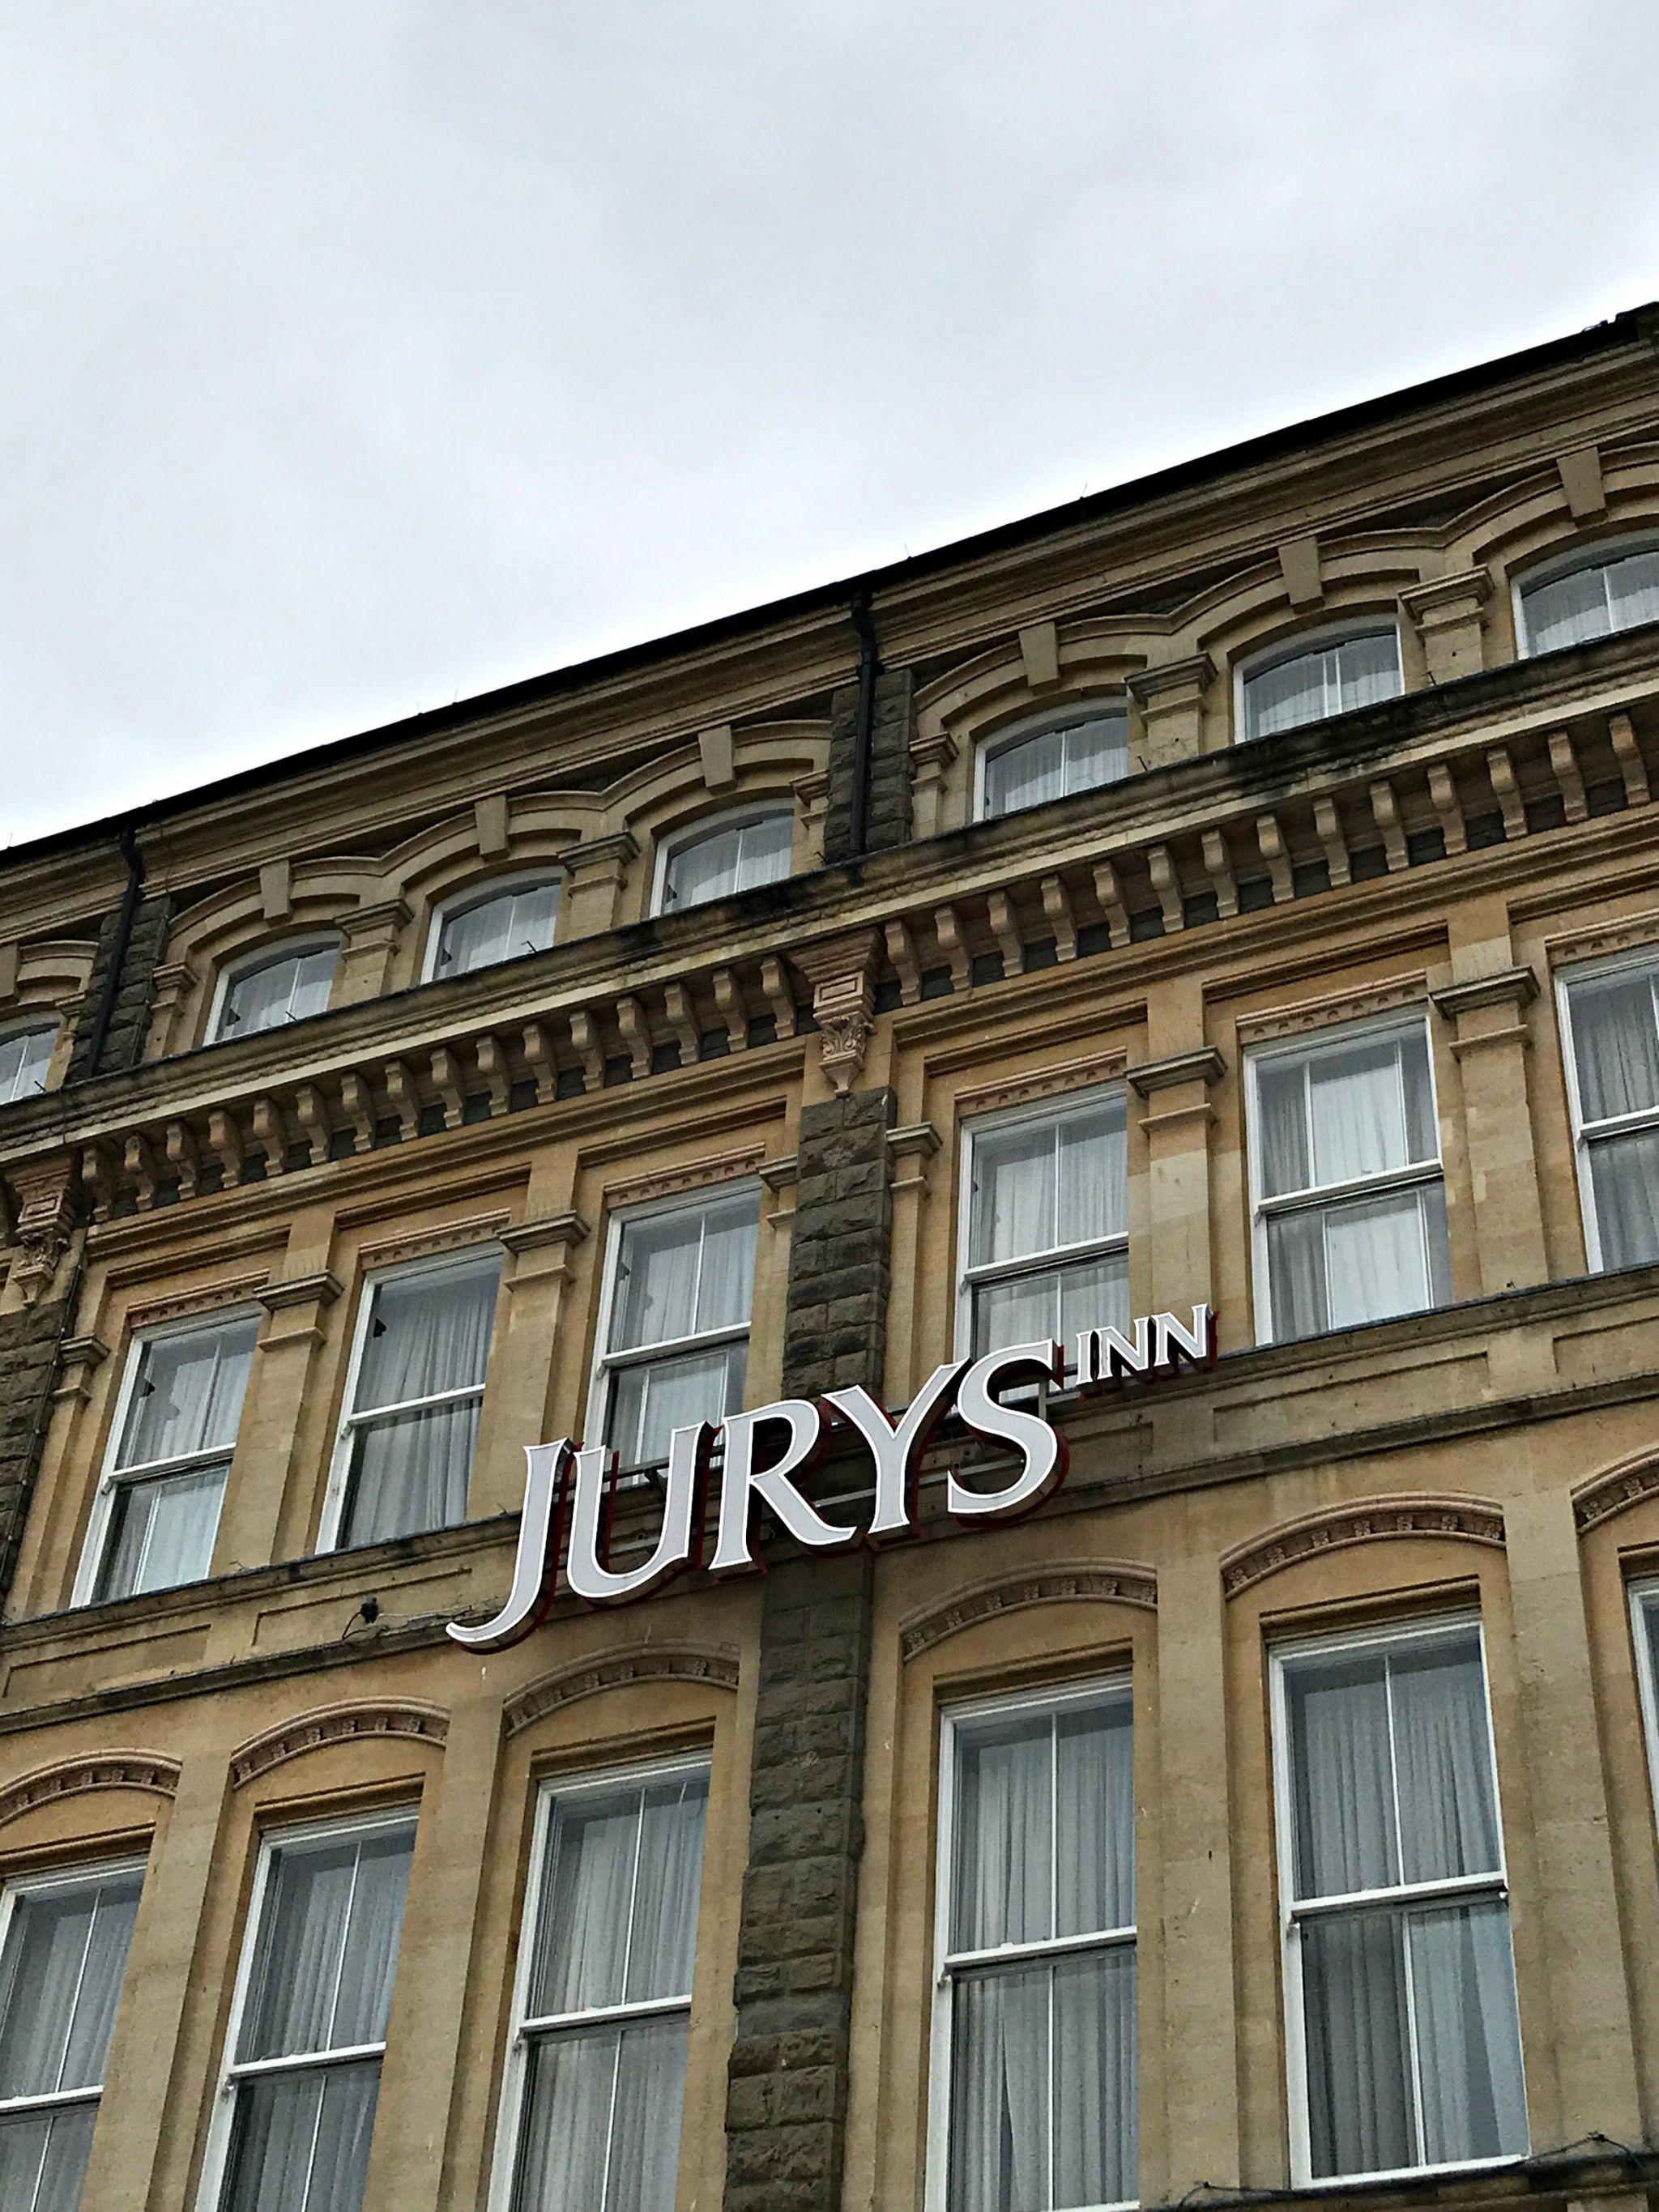 Jurys Hotel Cardiff